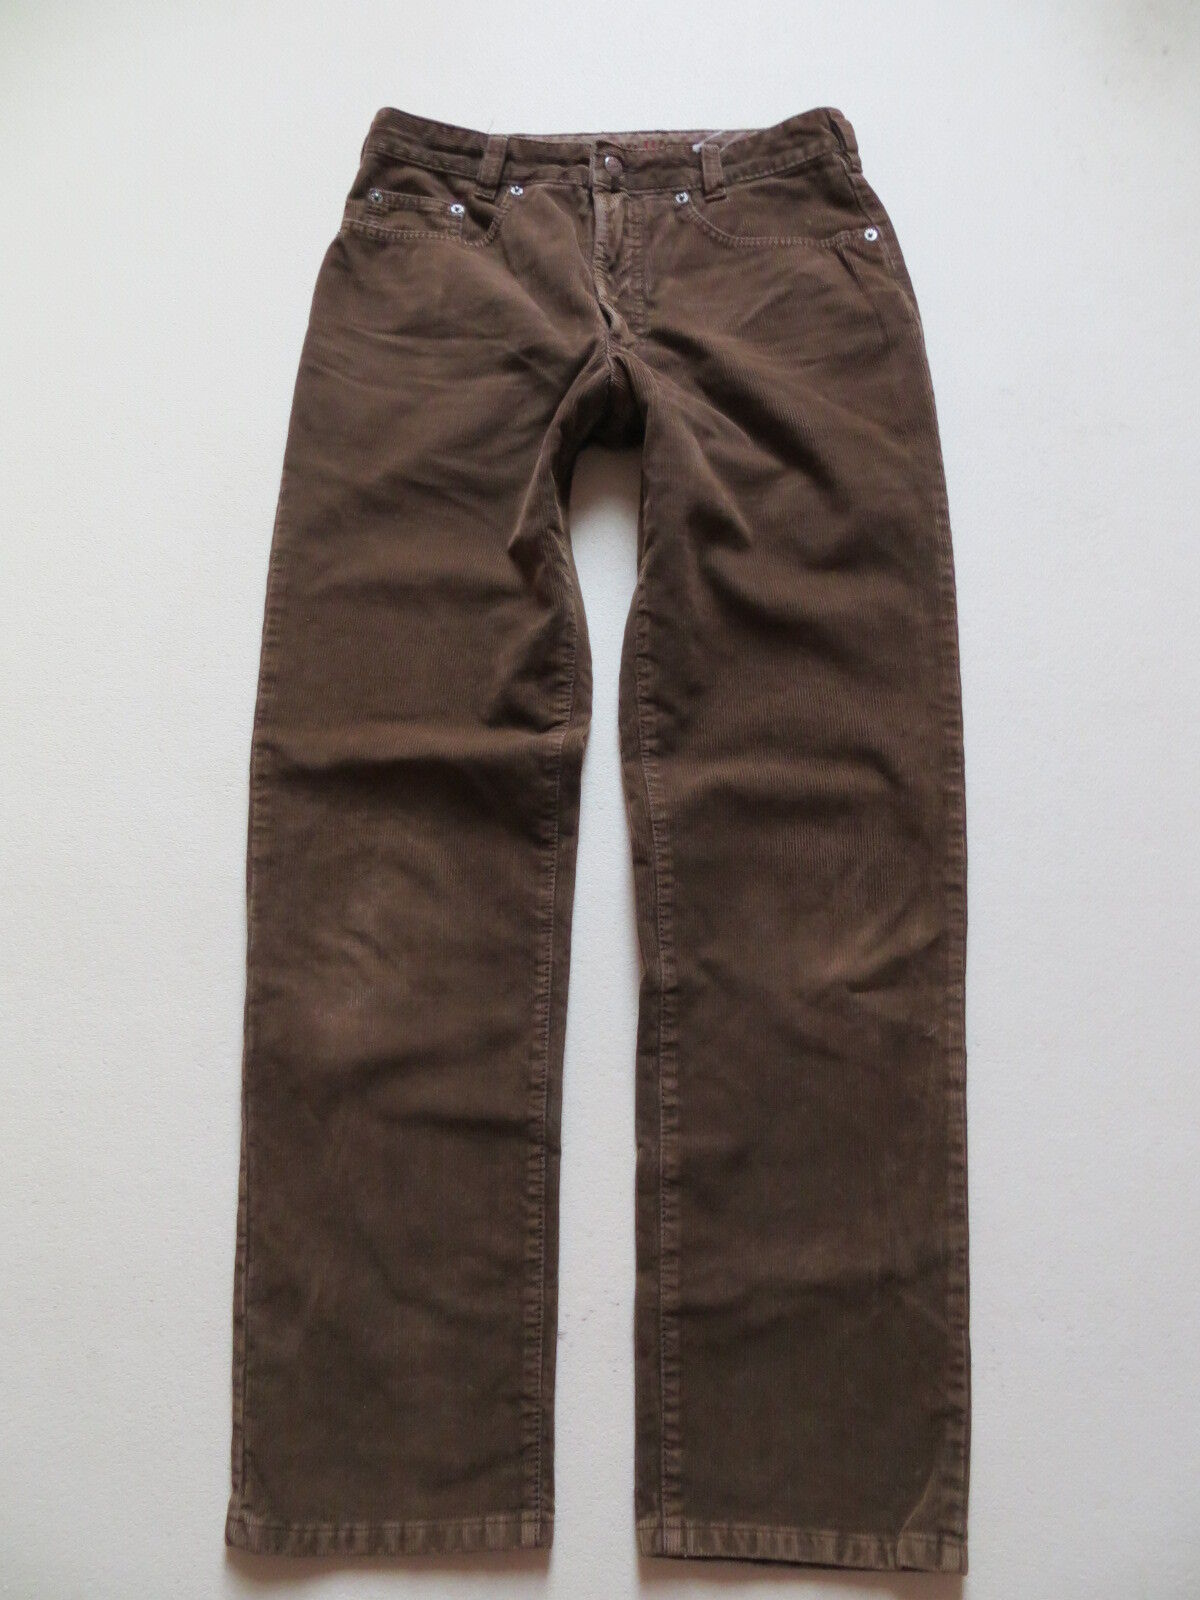 JOKER Jeans Harlem Walker Cord Hose W 31  L 32 braun Hochwertig & Robust RAR